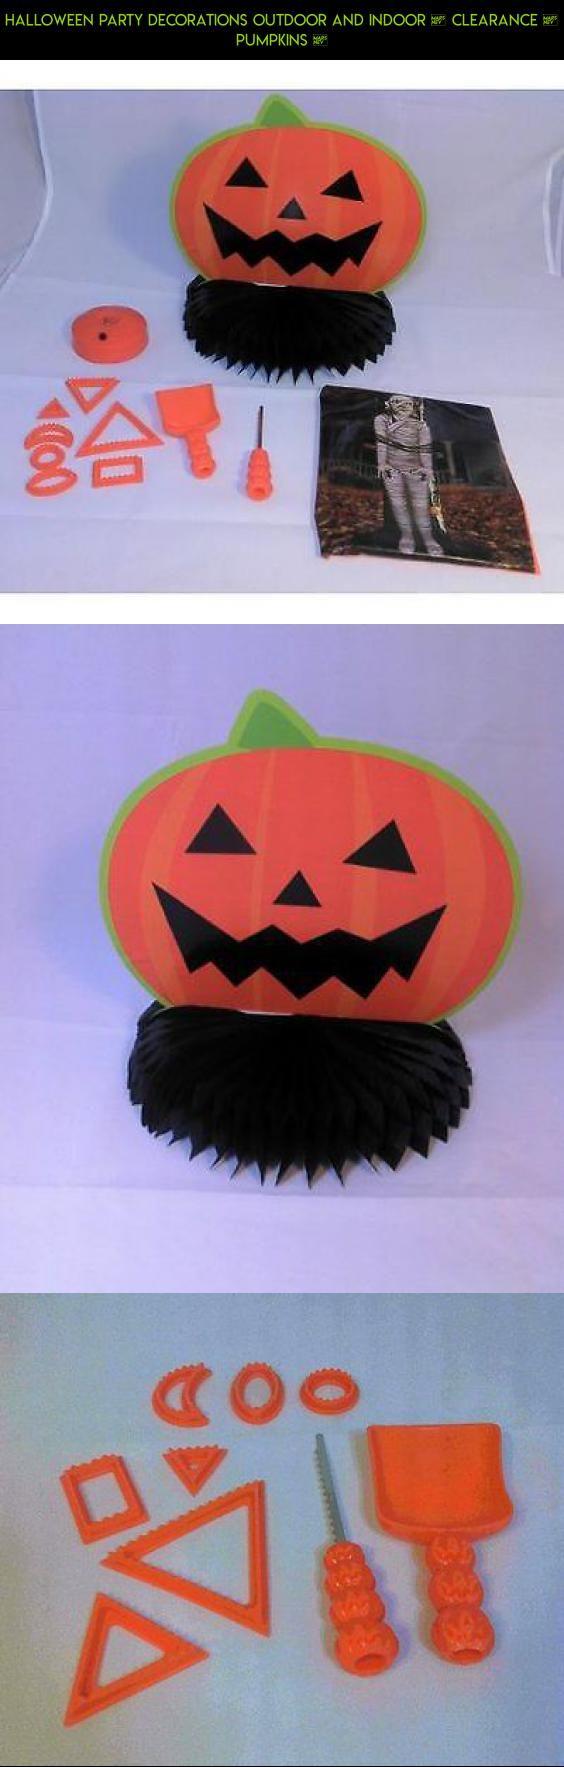 Best 20+ Halloween decorations clearance ideas on Pinterest | Diy ...